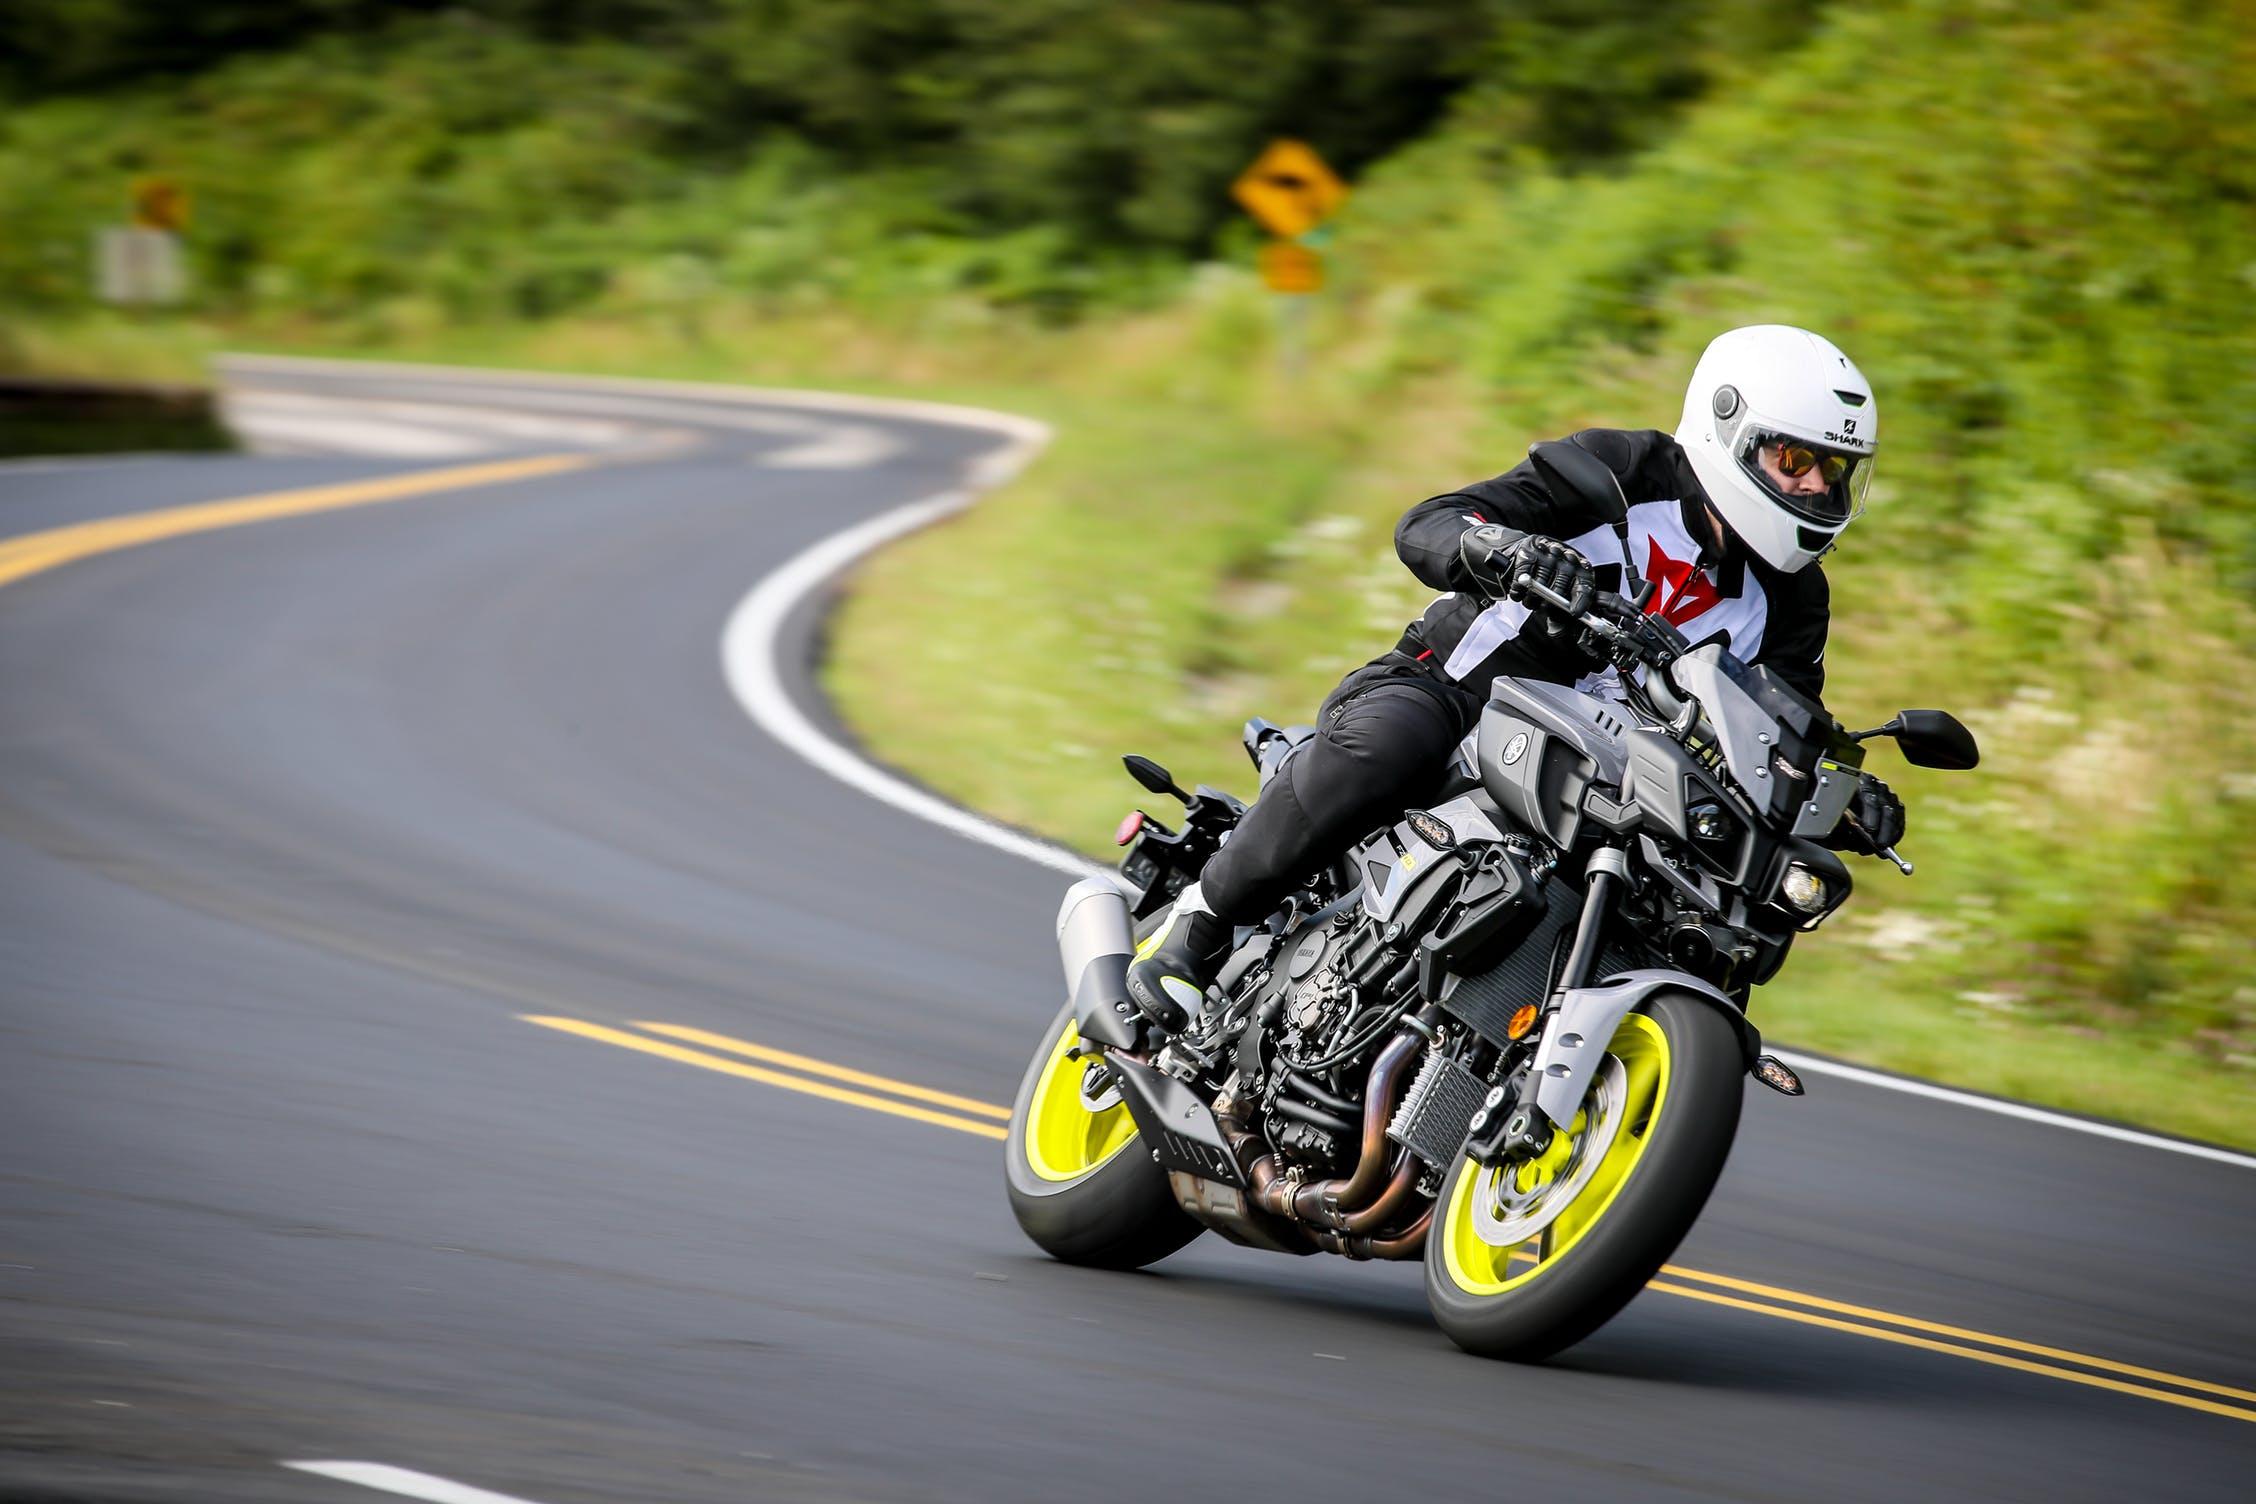 What is a liter bike? - RevZilla